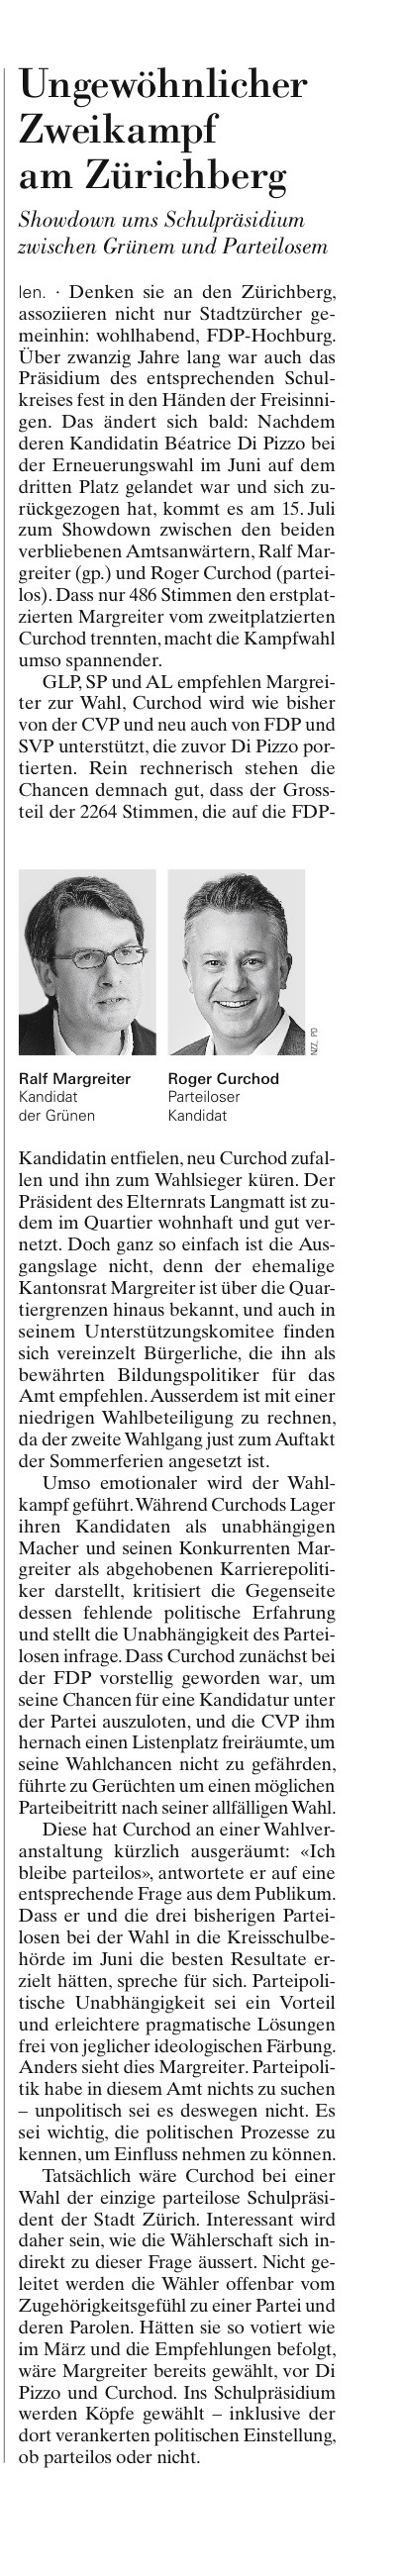 NZZ 2018.07.09_Schulpräsidium Zürichberg.jpg